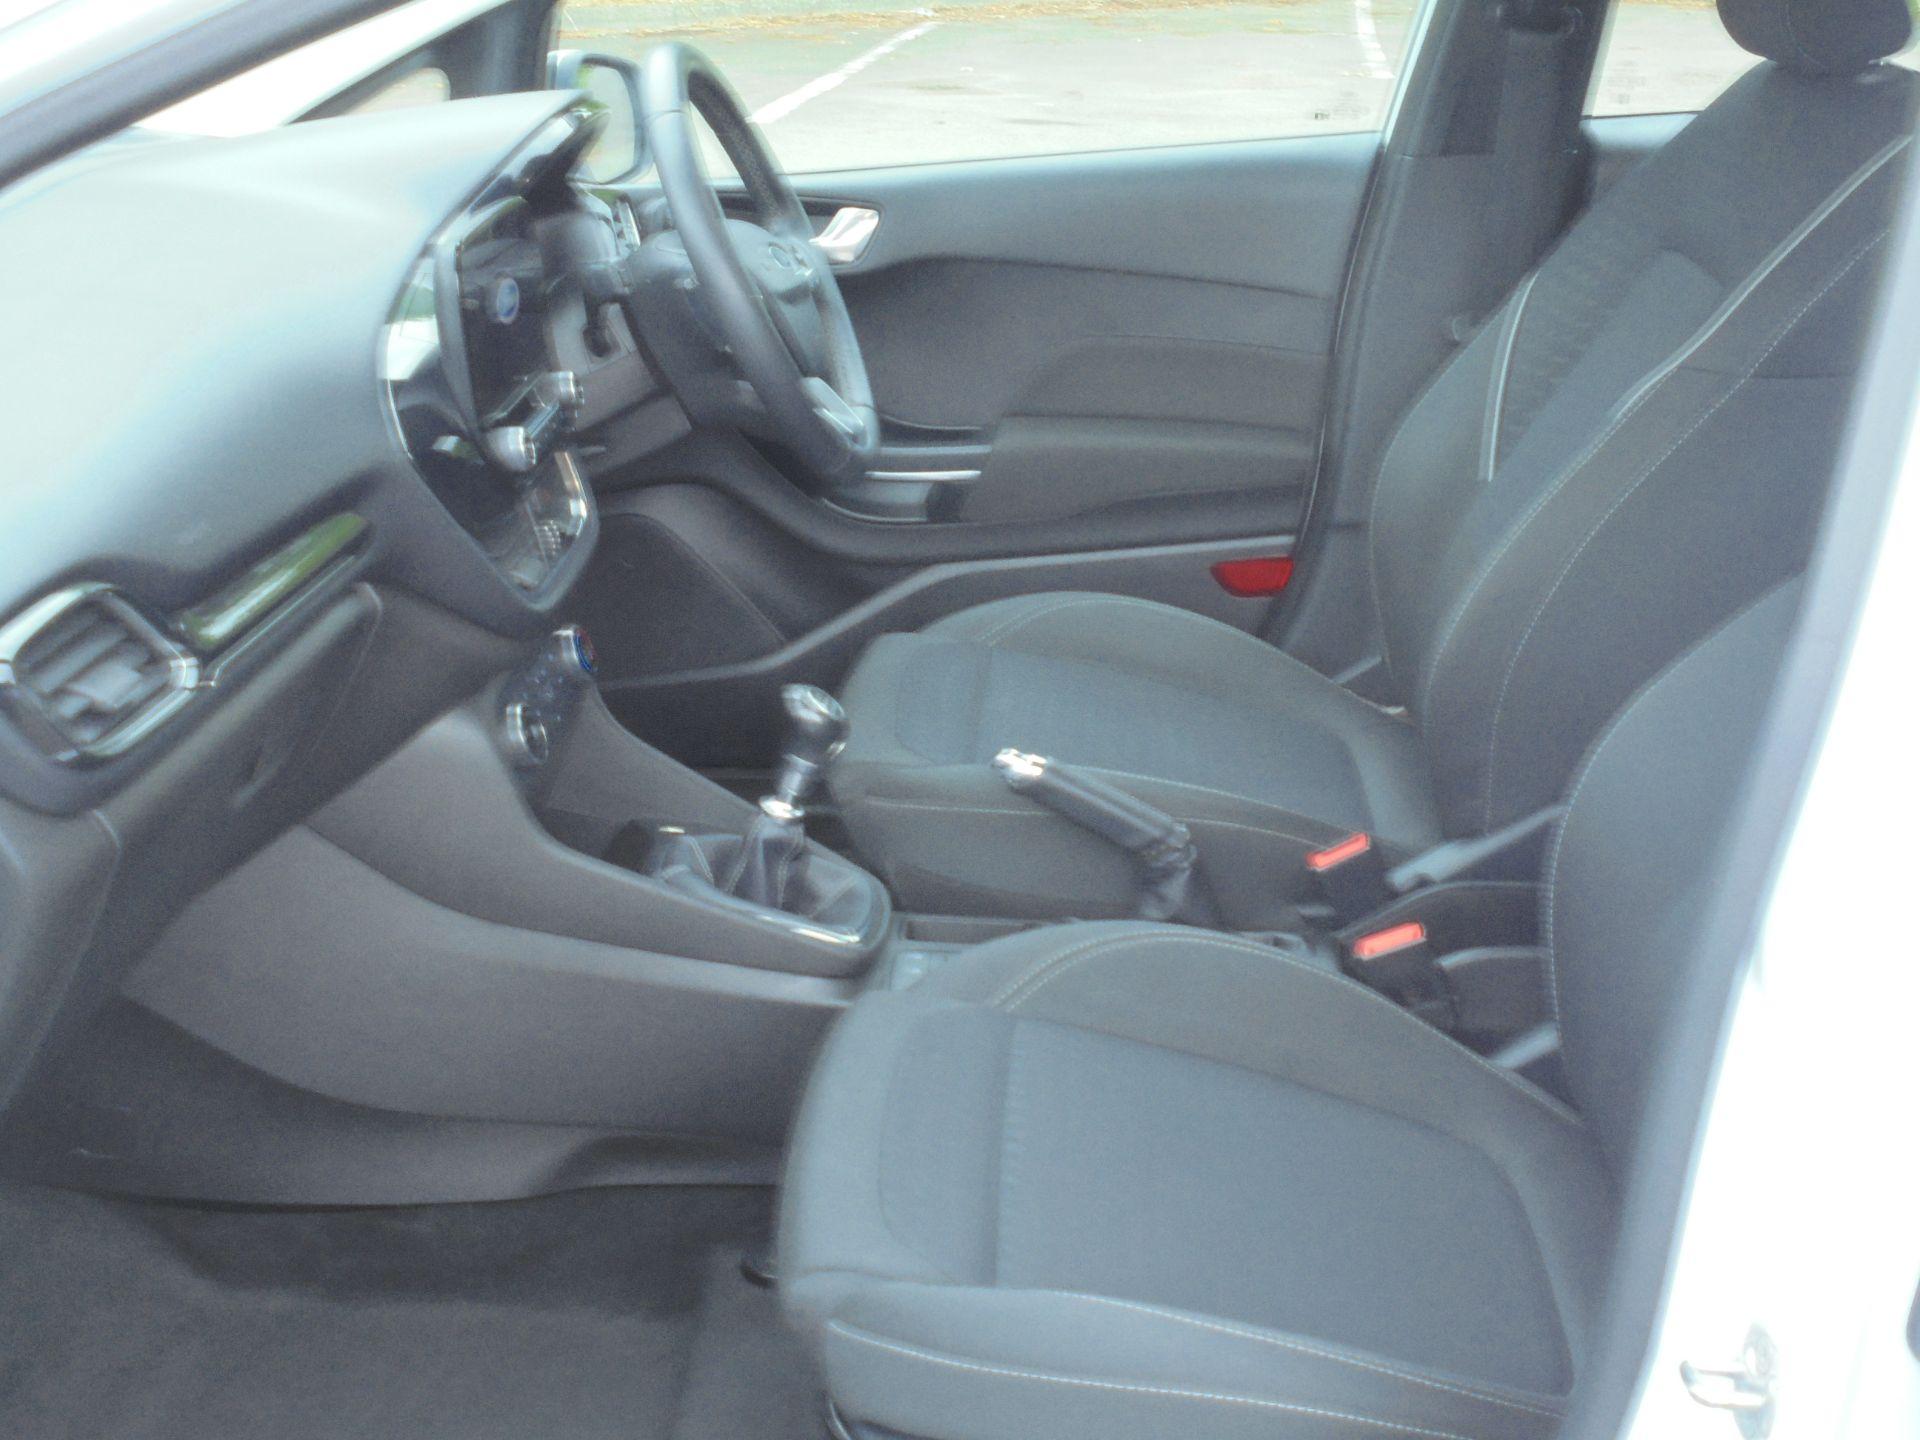 2018 Ford Fiesta 1.5 Tdci Zetec 5Dr (FD18WHU) Image 5